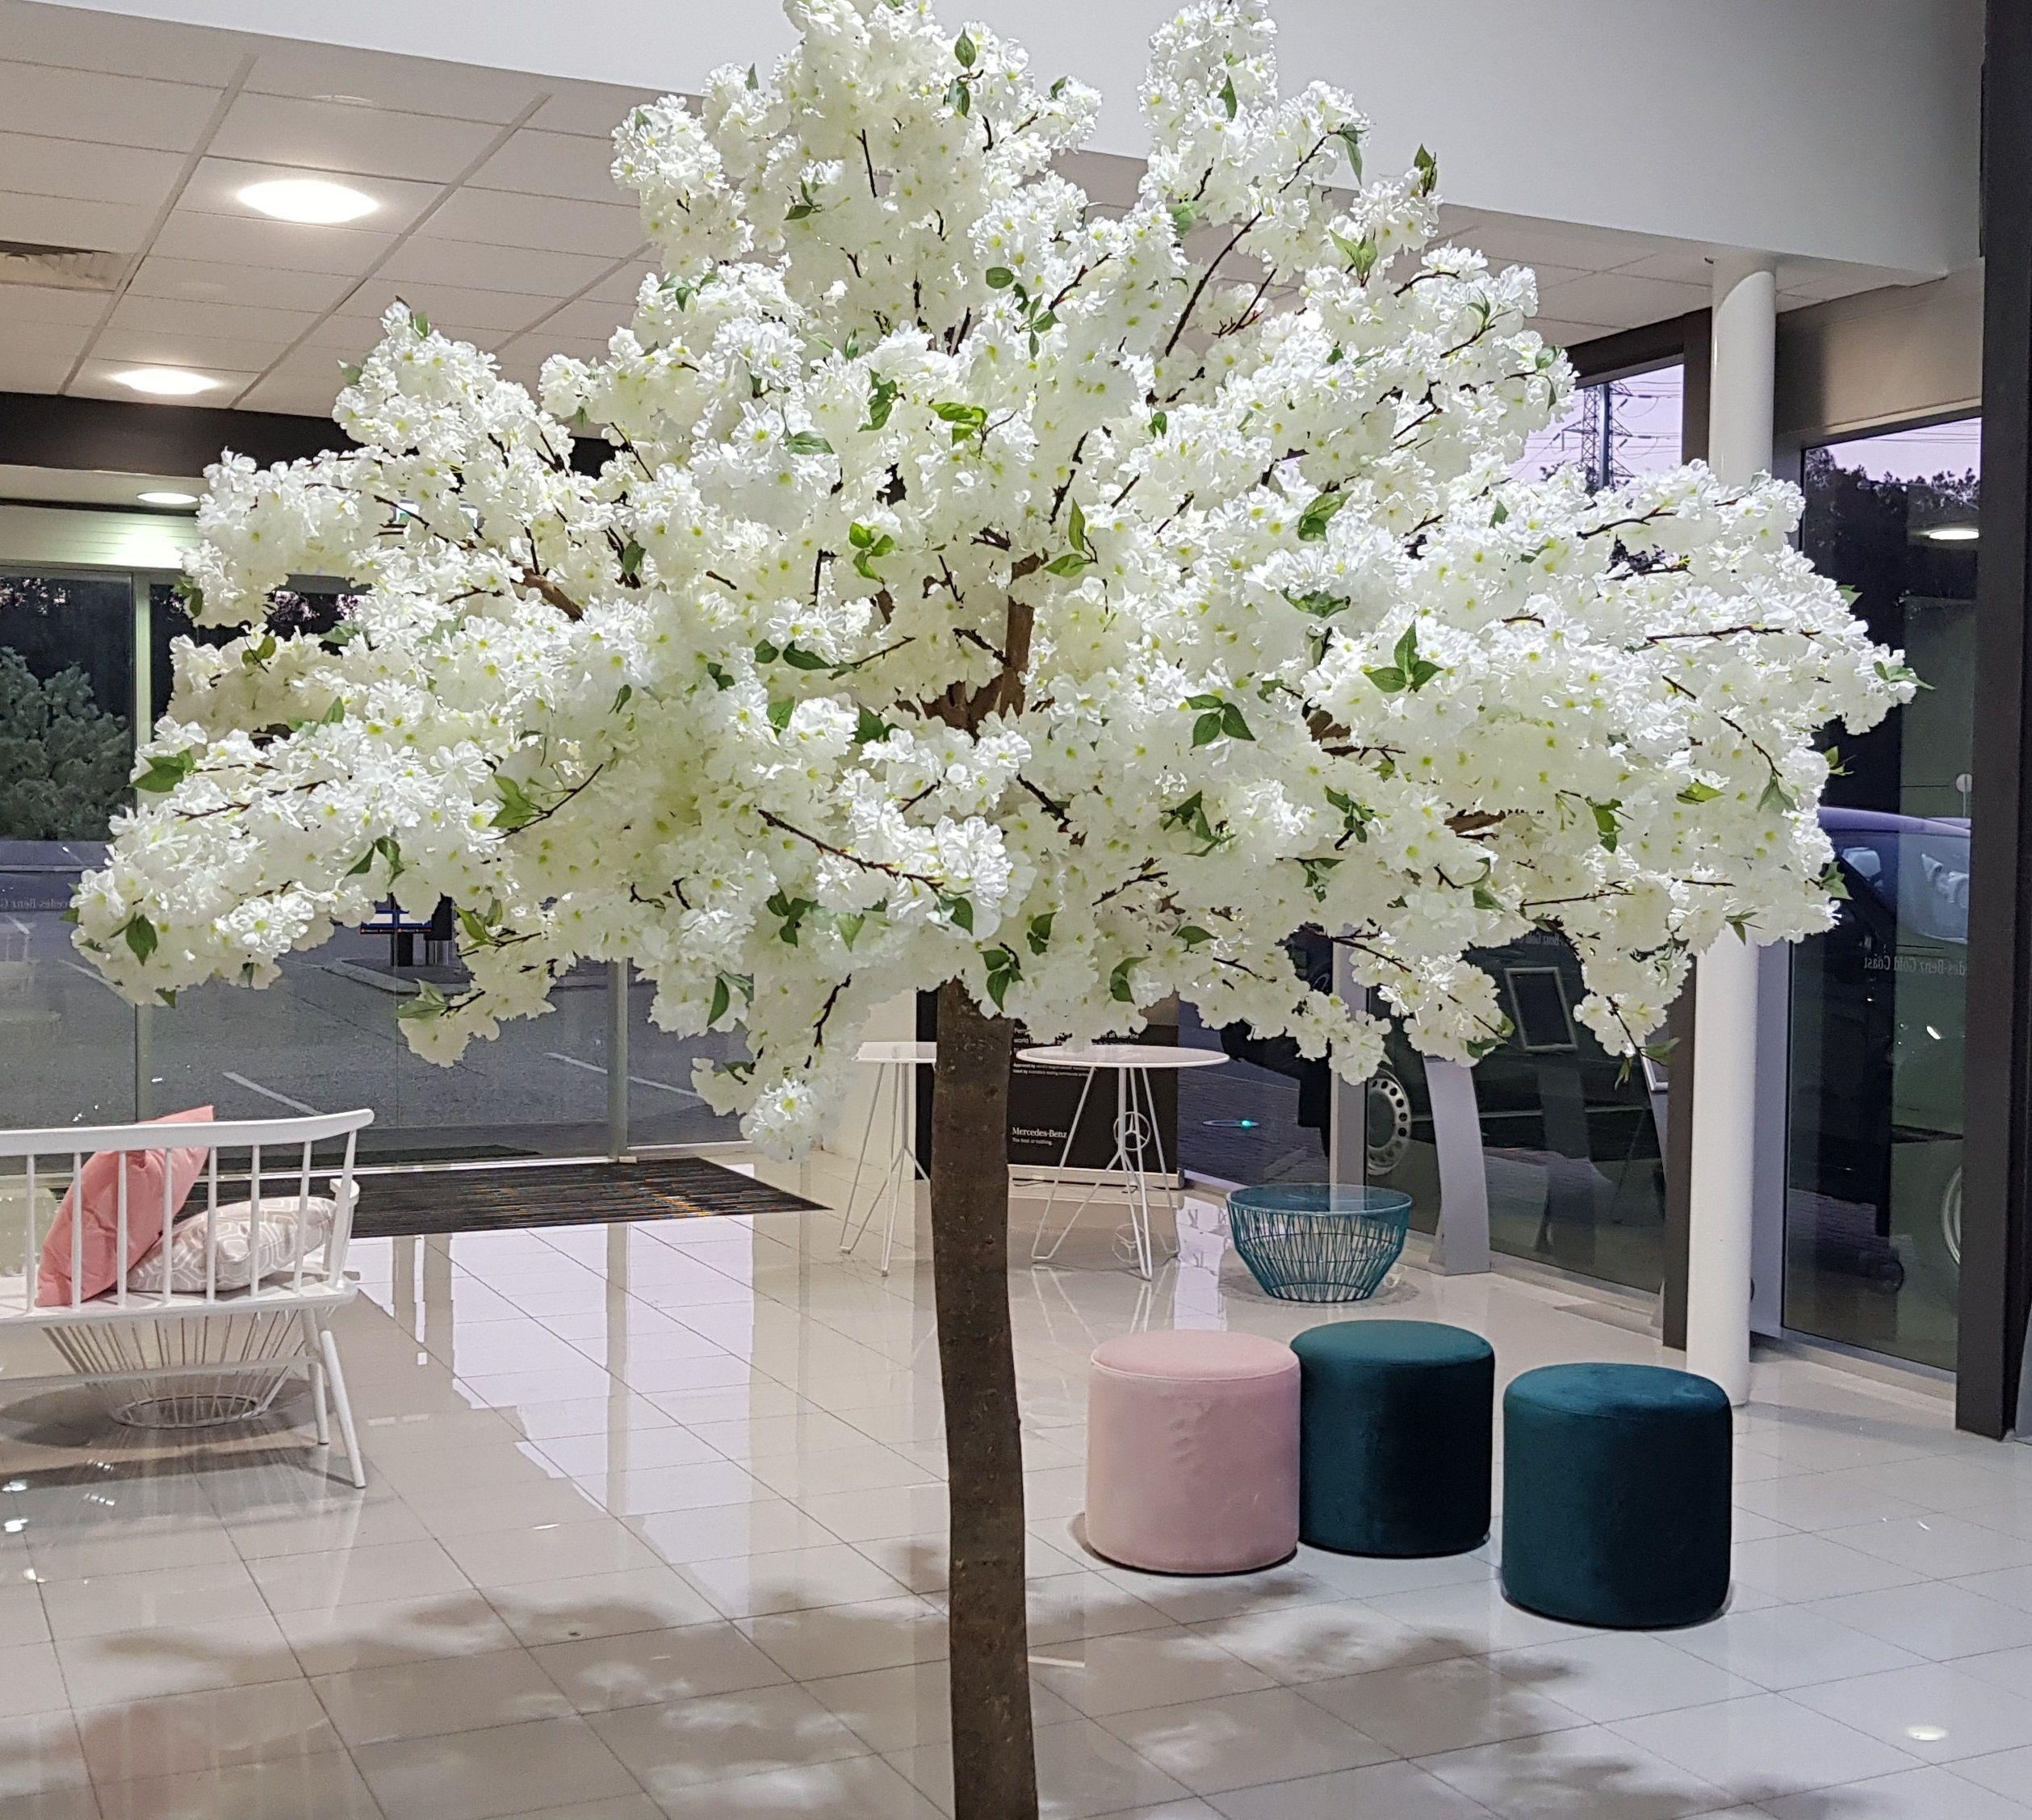 Our 2 5m High Upright White Cherry Blossom Trees Mercedesbenzgoldcoast Wedding Goldcoastweddings Fl Insta Wedding White Cherry Blossom Wedding Arbour